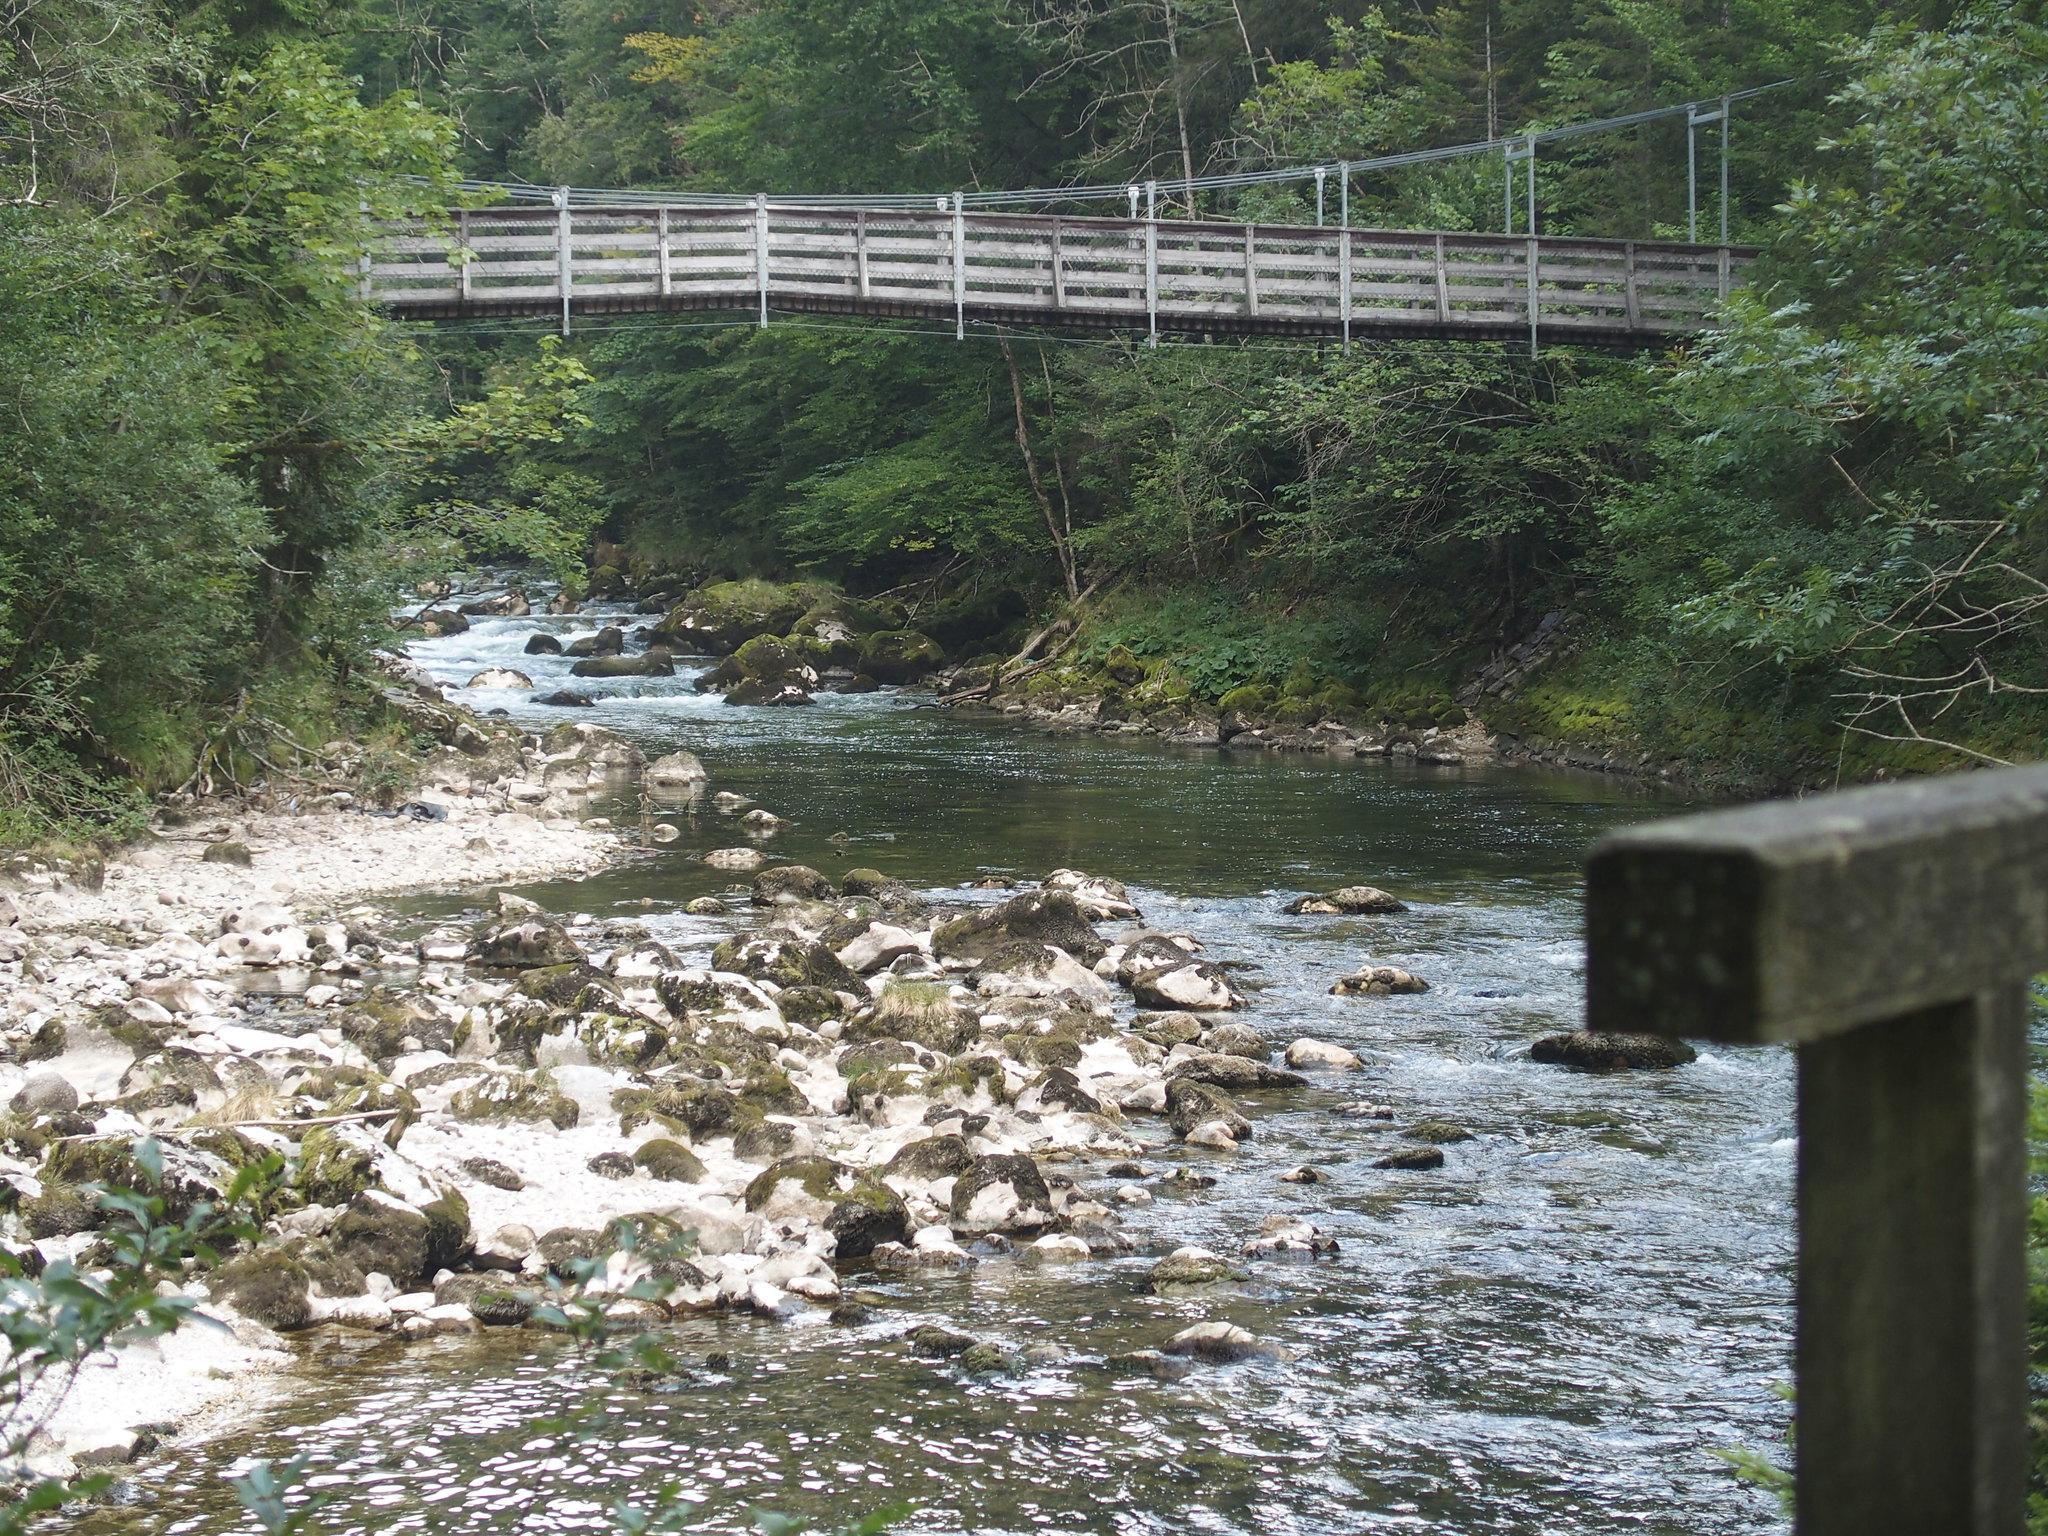 Bron över Traun